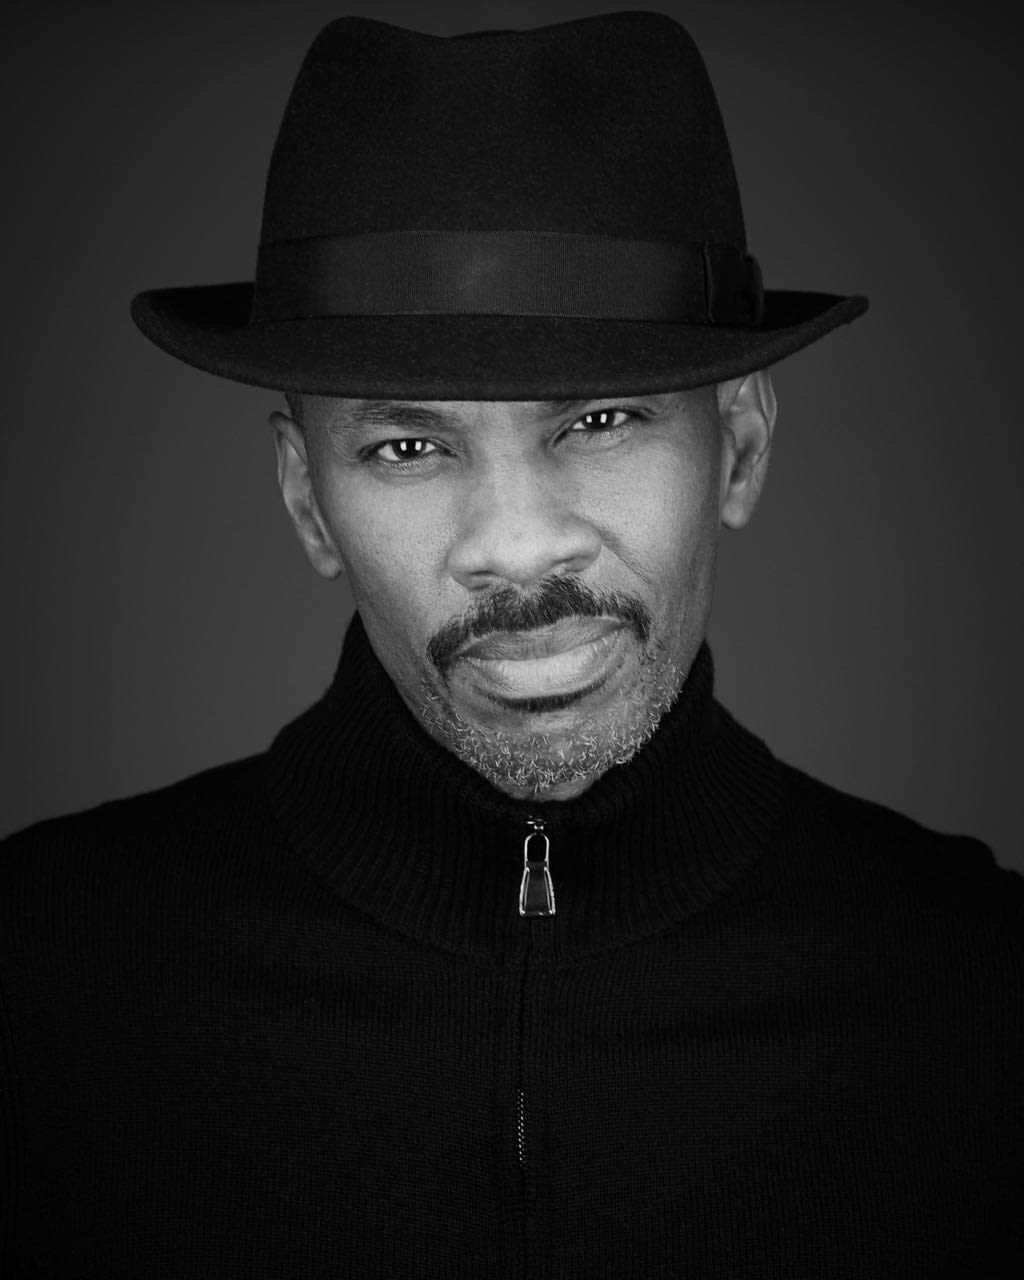 Black and White Hat Headshot